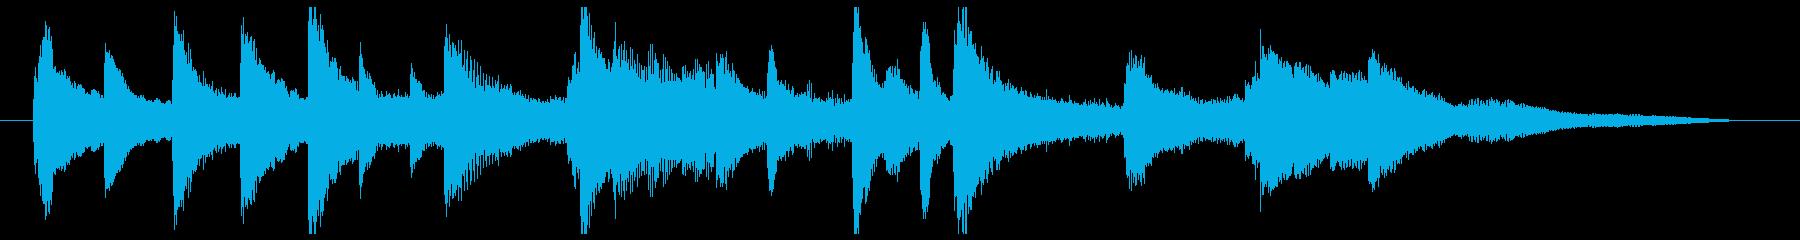 Piano01・ジングル・優しいの再生済みの波形